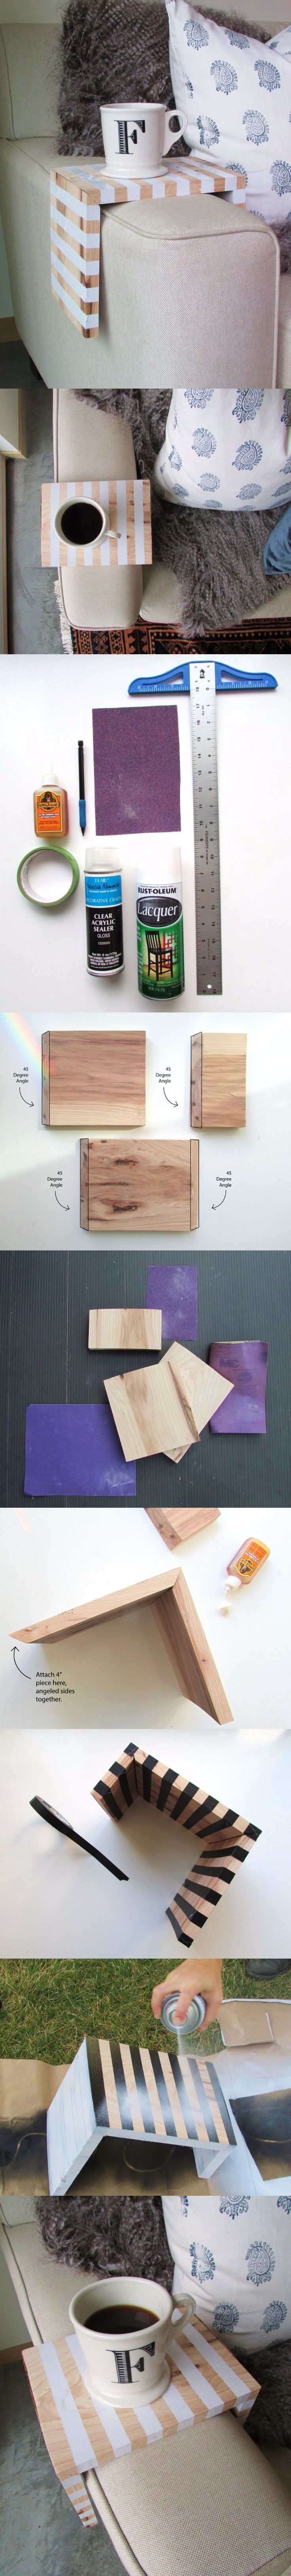 Mesita de madera para sofa - Va http://francoisetmoi.com/